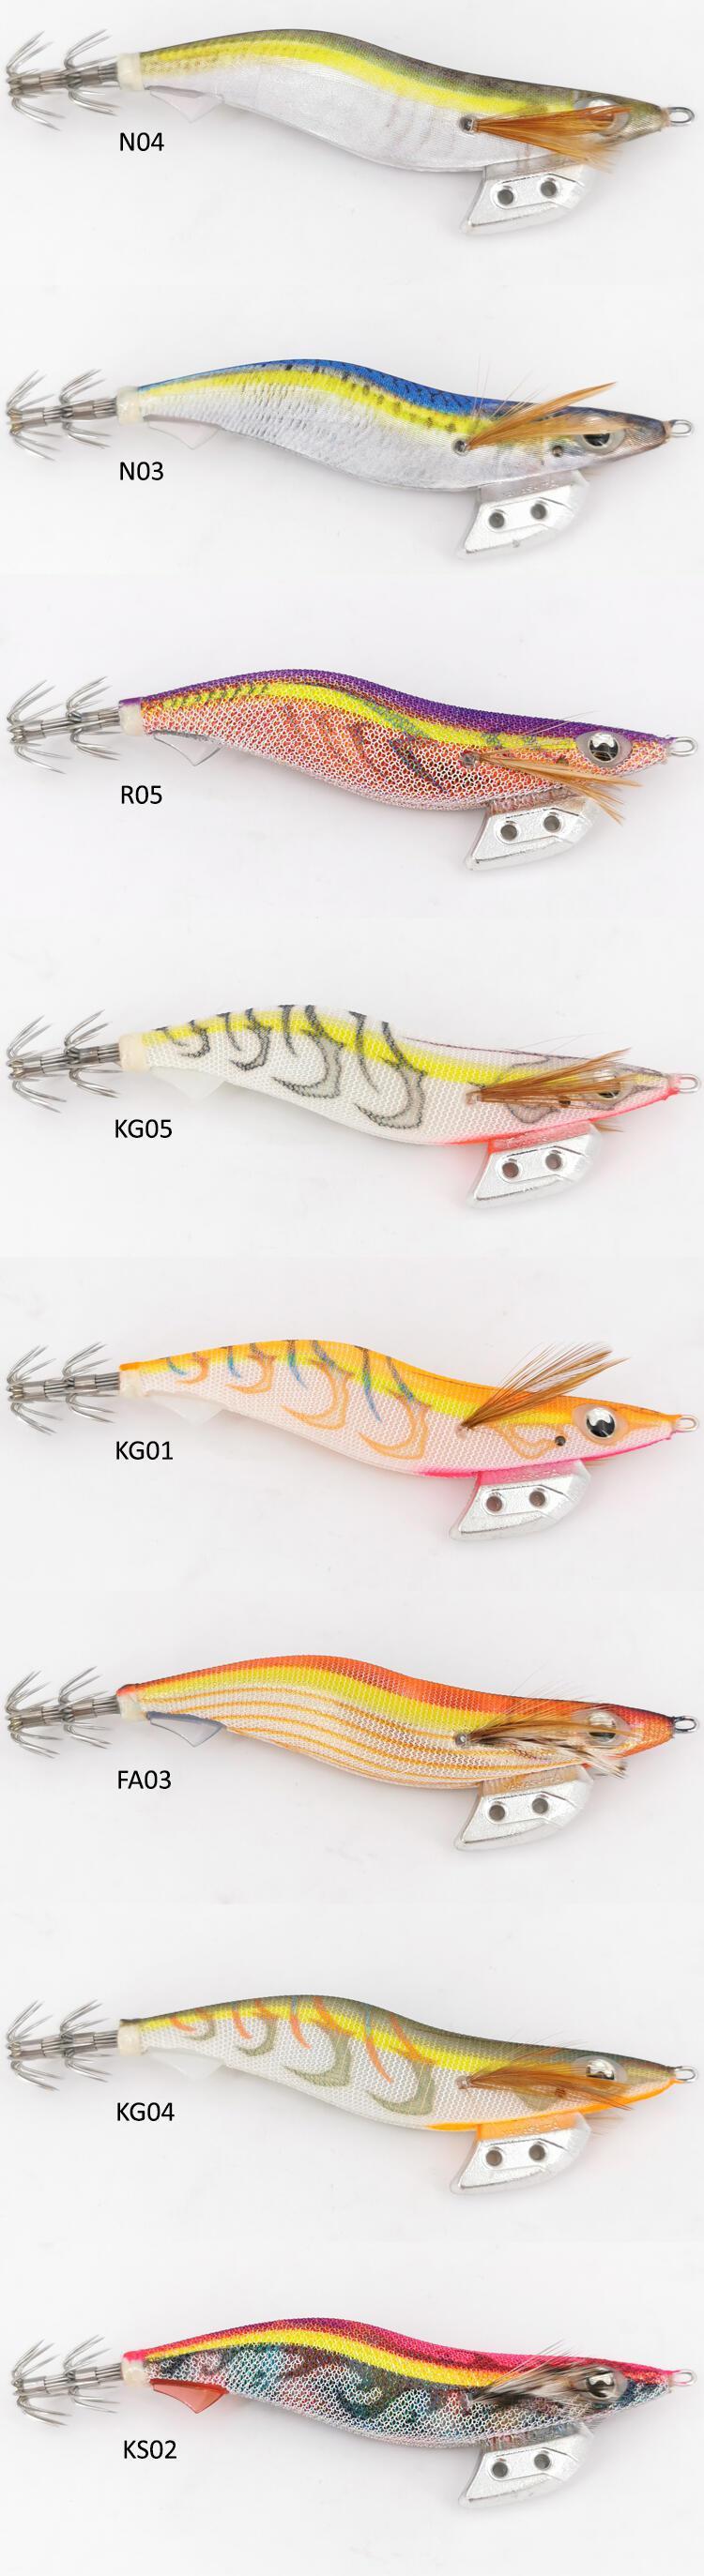 Egi Egio K 3SS # 003 Rose Gold 606,973 Yamashita YAMASHITA